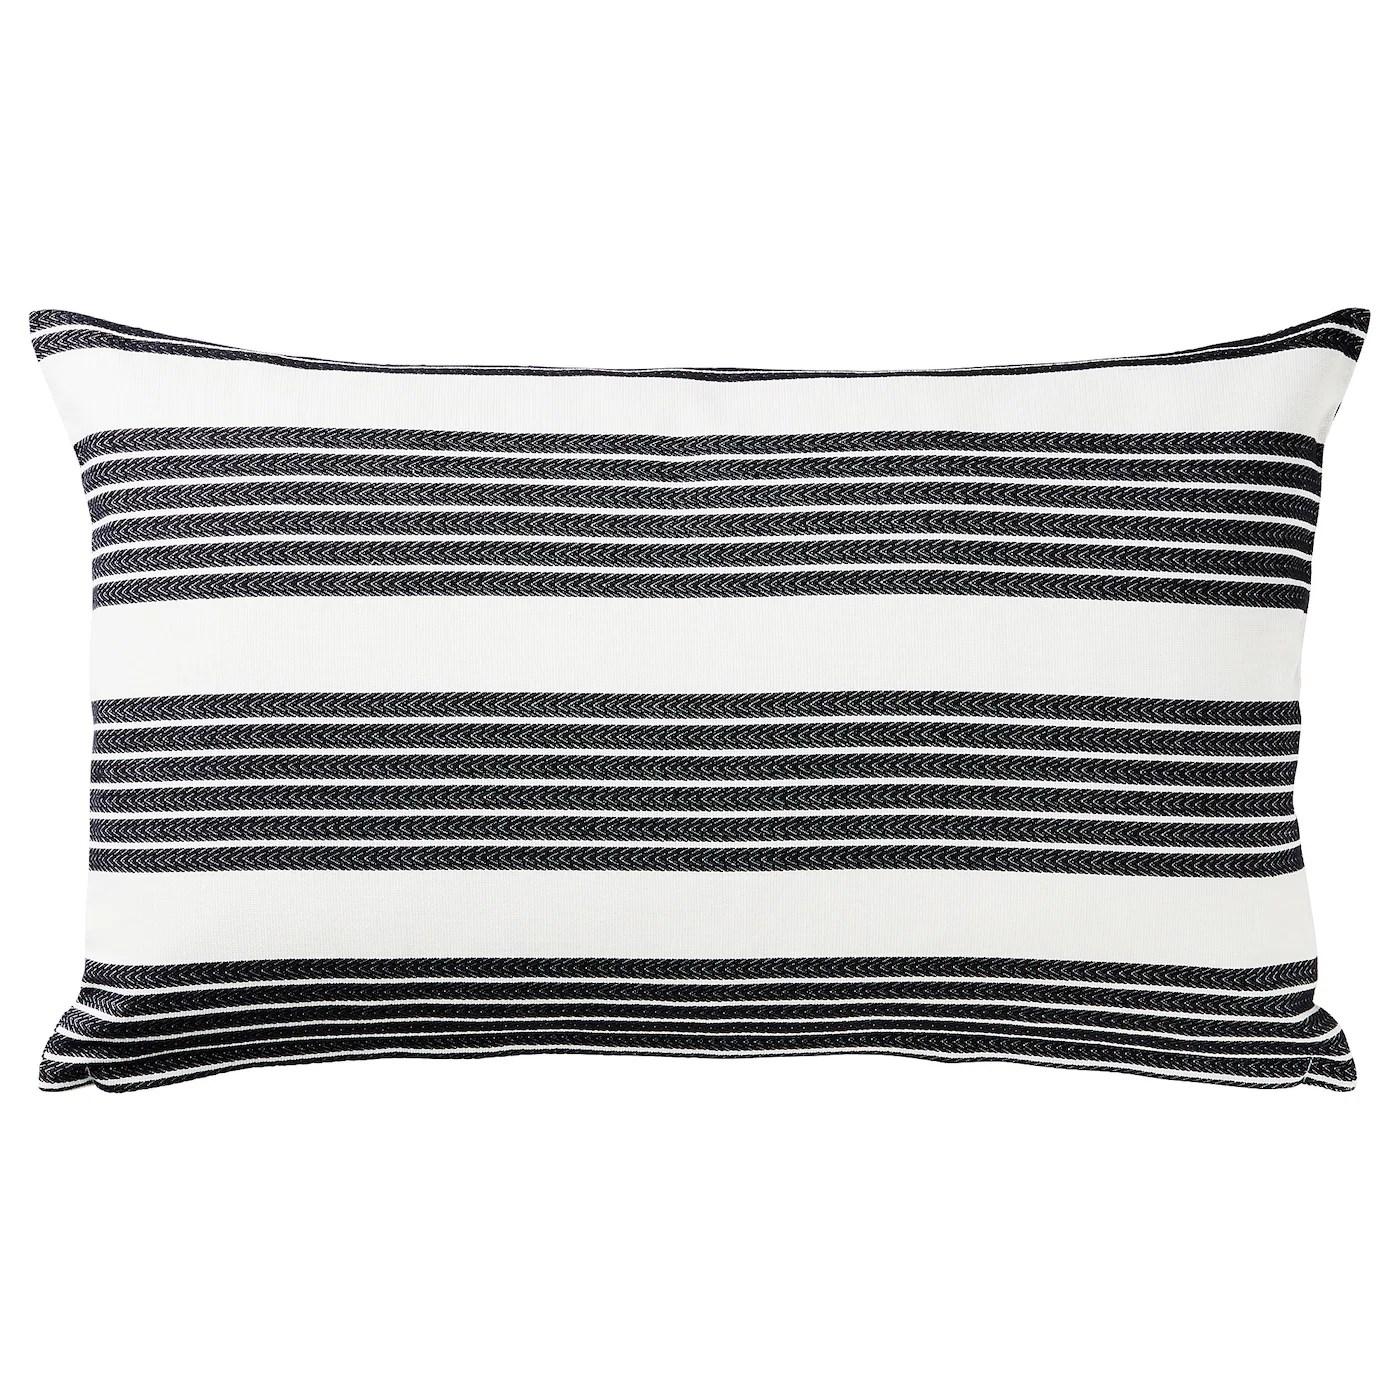 cushions cushion covers decorative